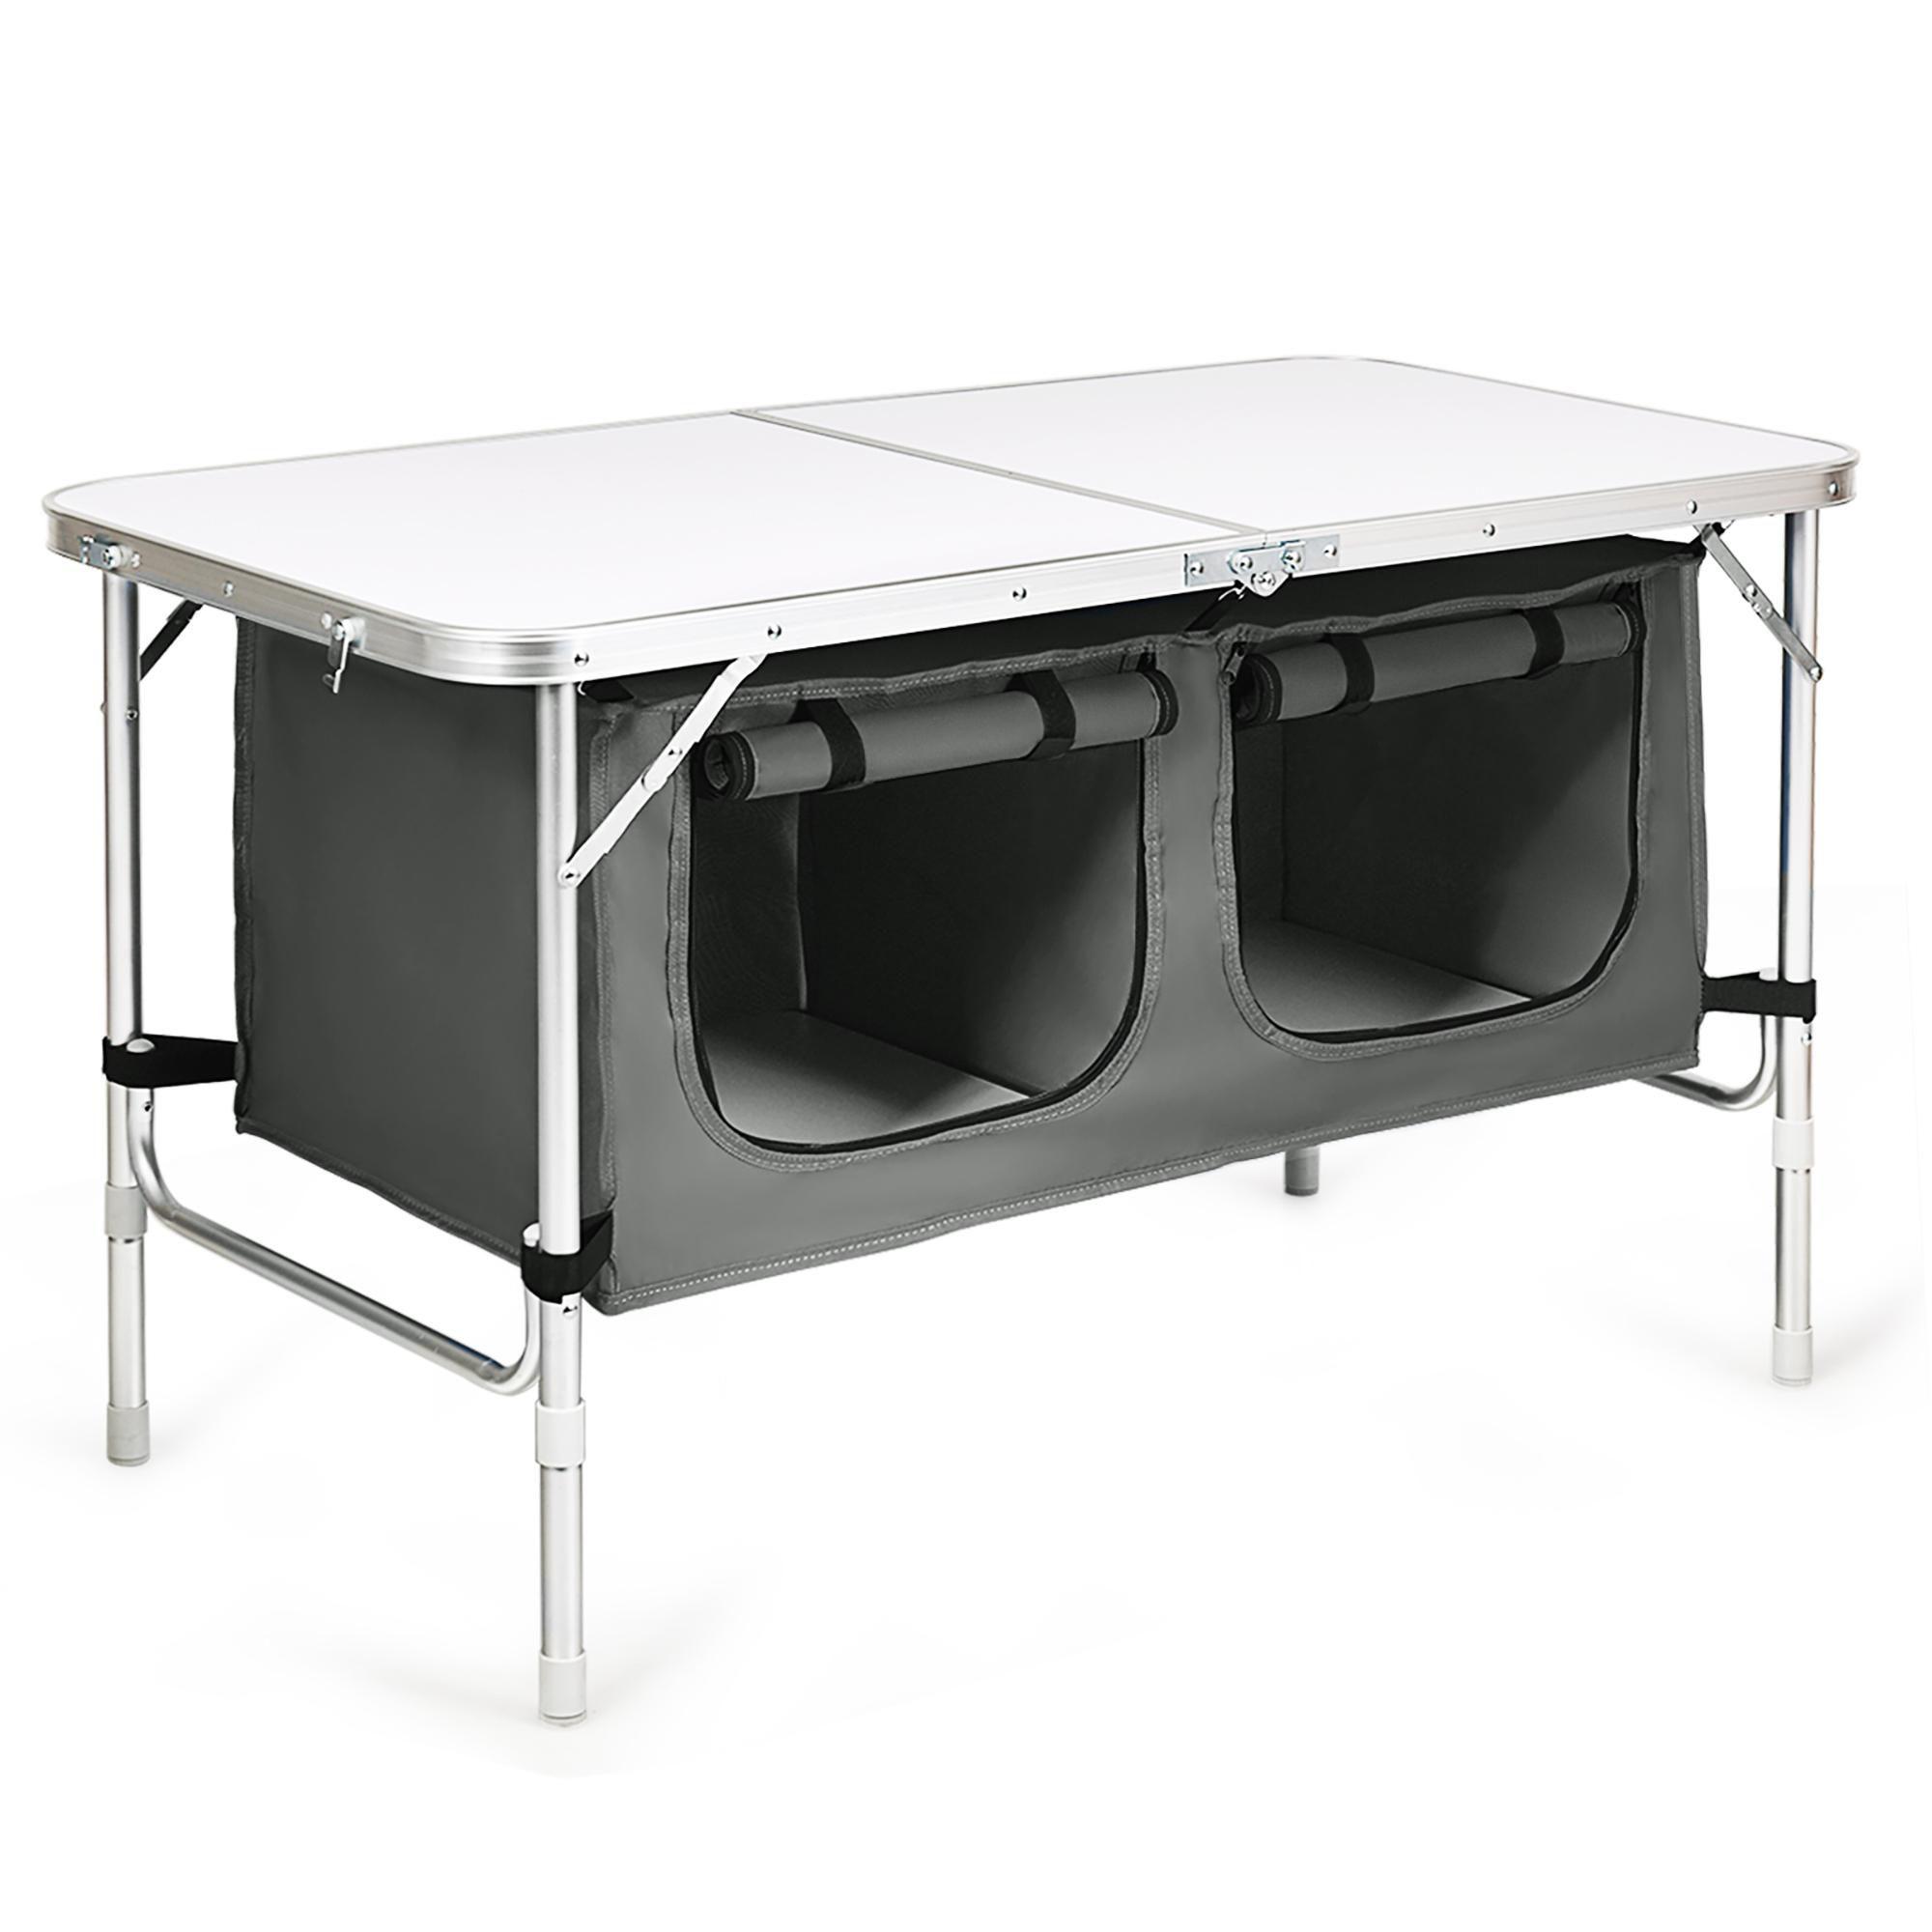 Costway Adjustable Camping Table Aluminum w/ Storage Organizer Grey